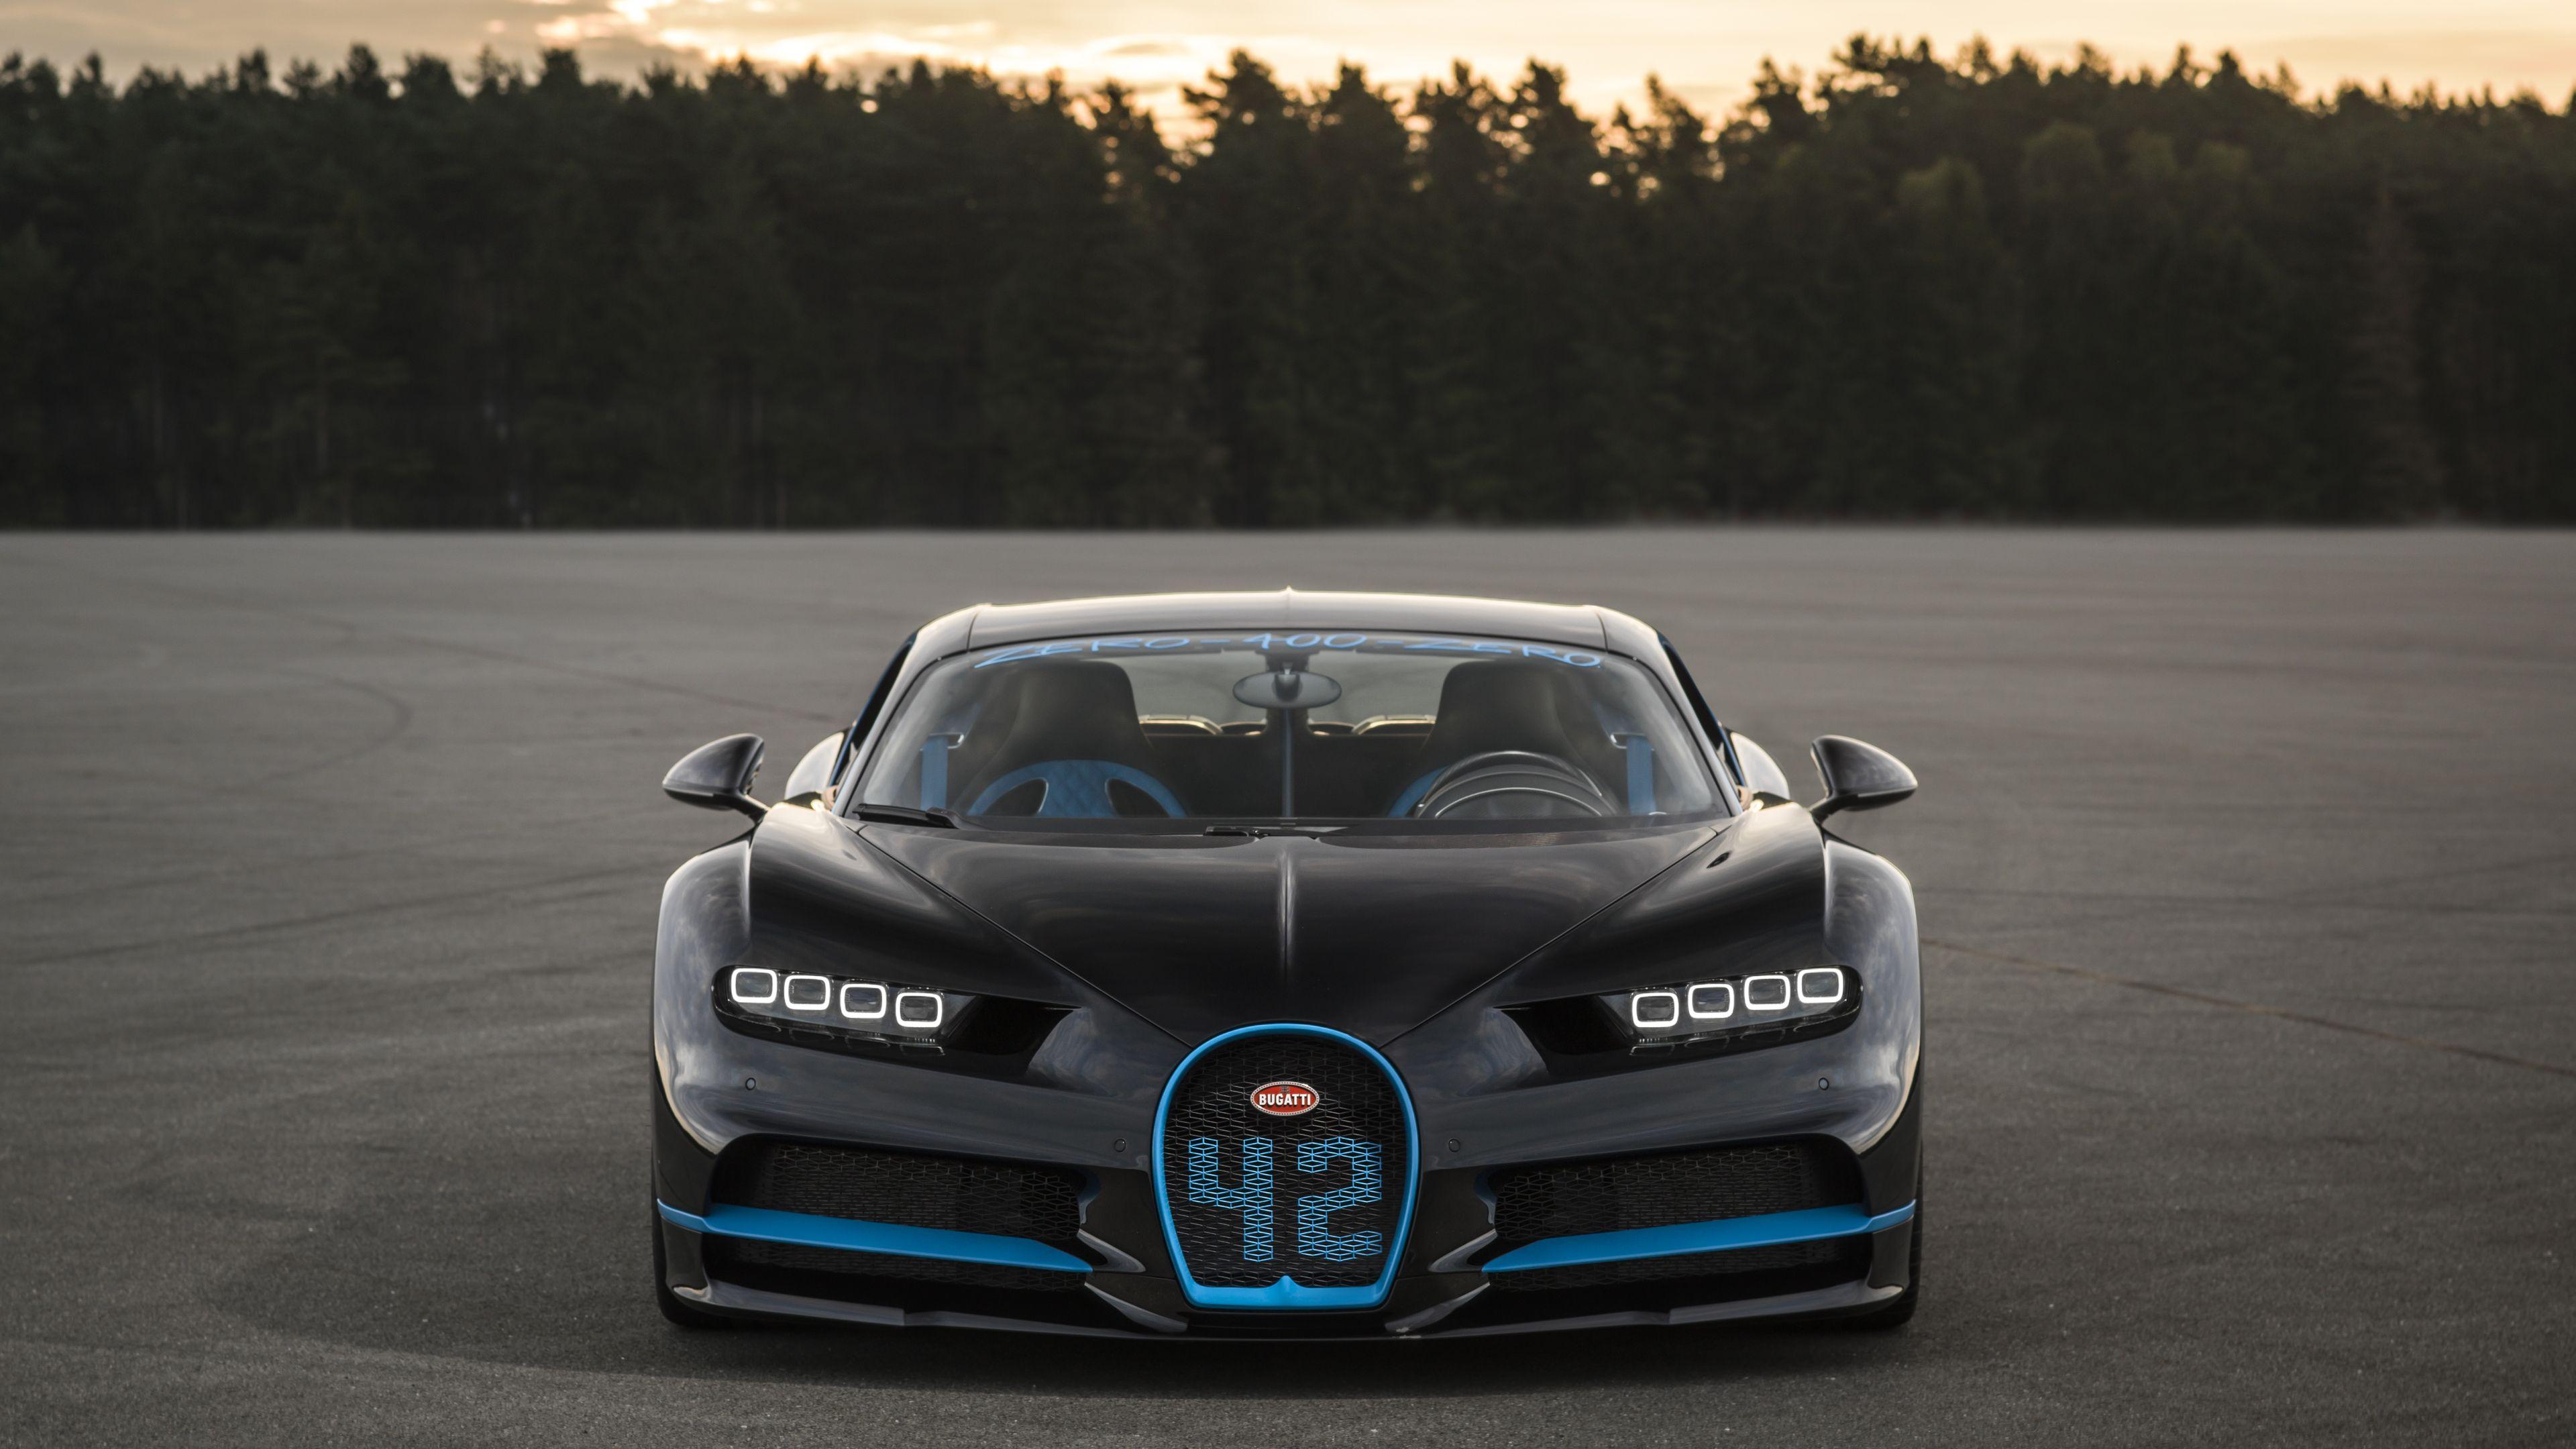 Sports cars hd wallpapers new tab theme. Bugatti Chiron New Photoshoot 4k Hd Wallpapers Cars Wallpapers Bugatti Chiron Wallpapers 5k Wallpapers 4k Wallpapers Bugatti Chiron Bugatti Car Wallpapers